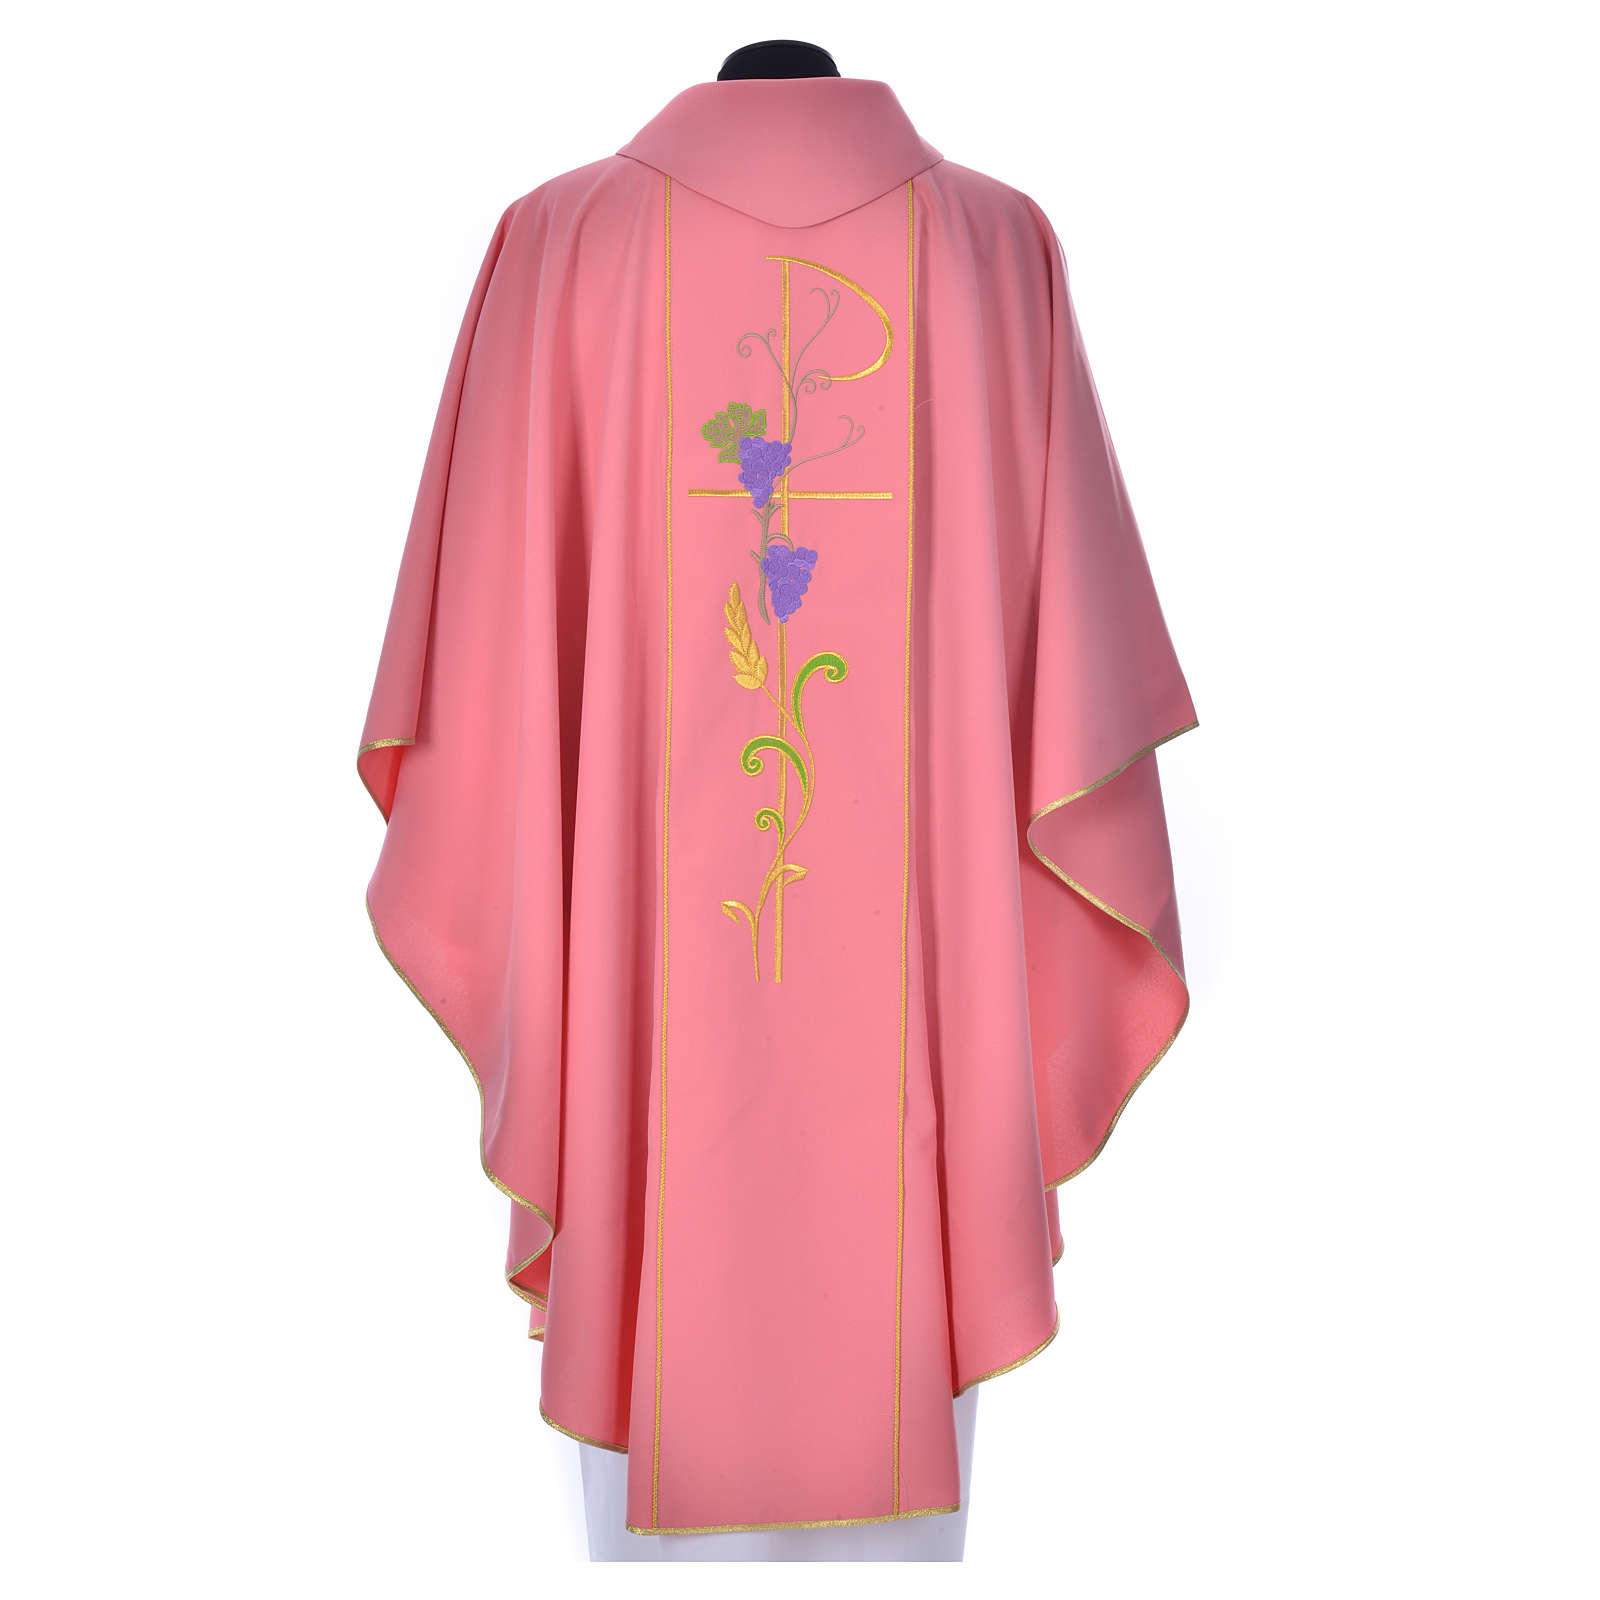 Casula sacerdotale rosa 100% poliestere XP uva spighe 4